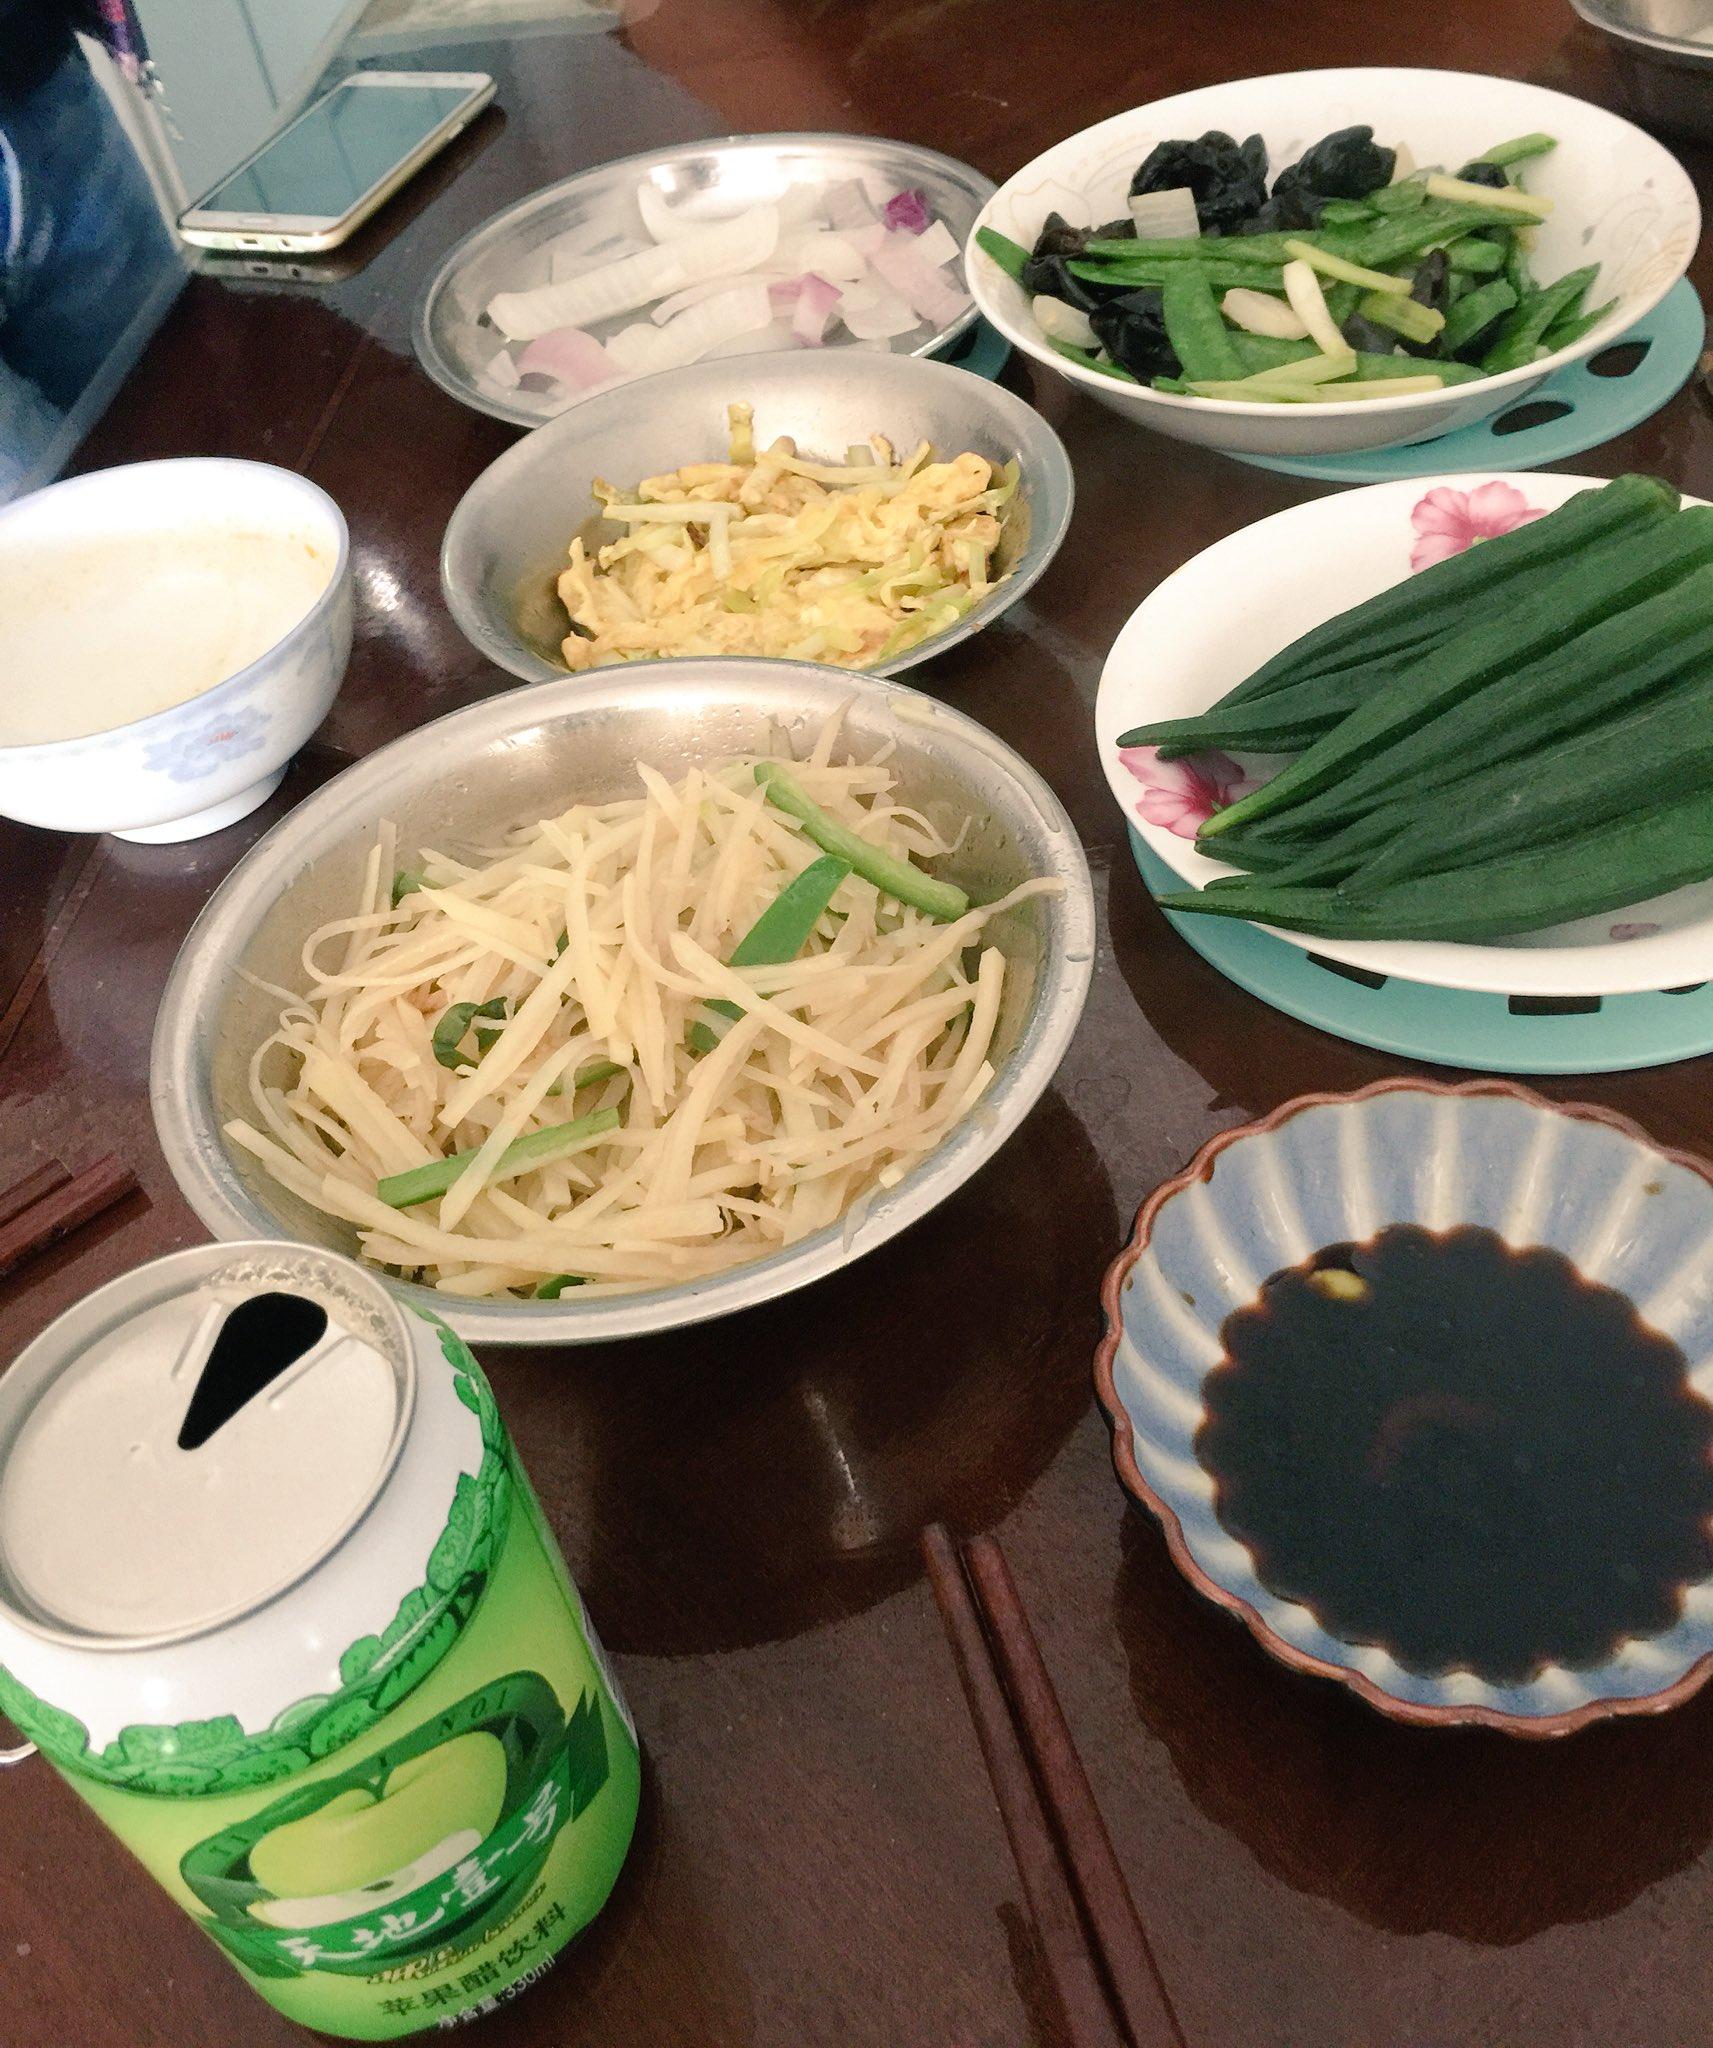 Learnt a new word at lunch today – 秋葵 qiūkuí (okra). https://t.co/rJ48PRIz5H